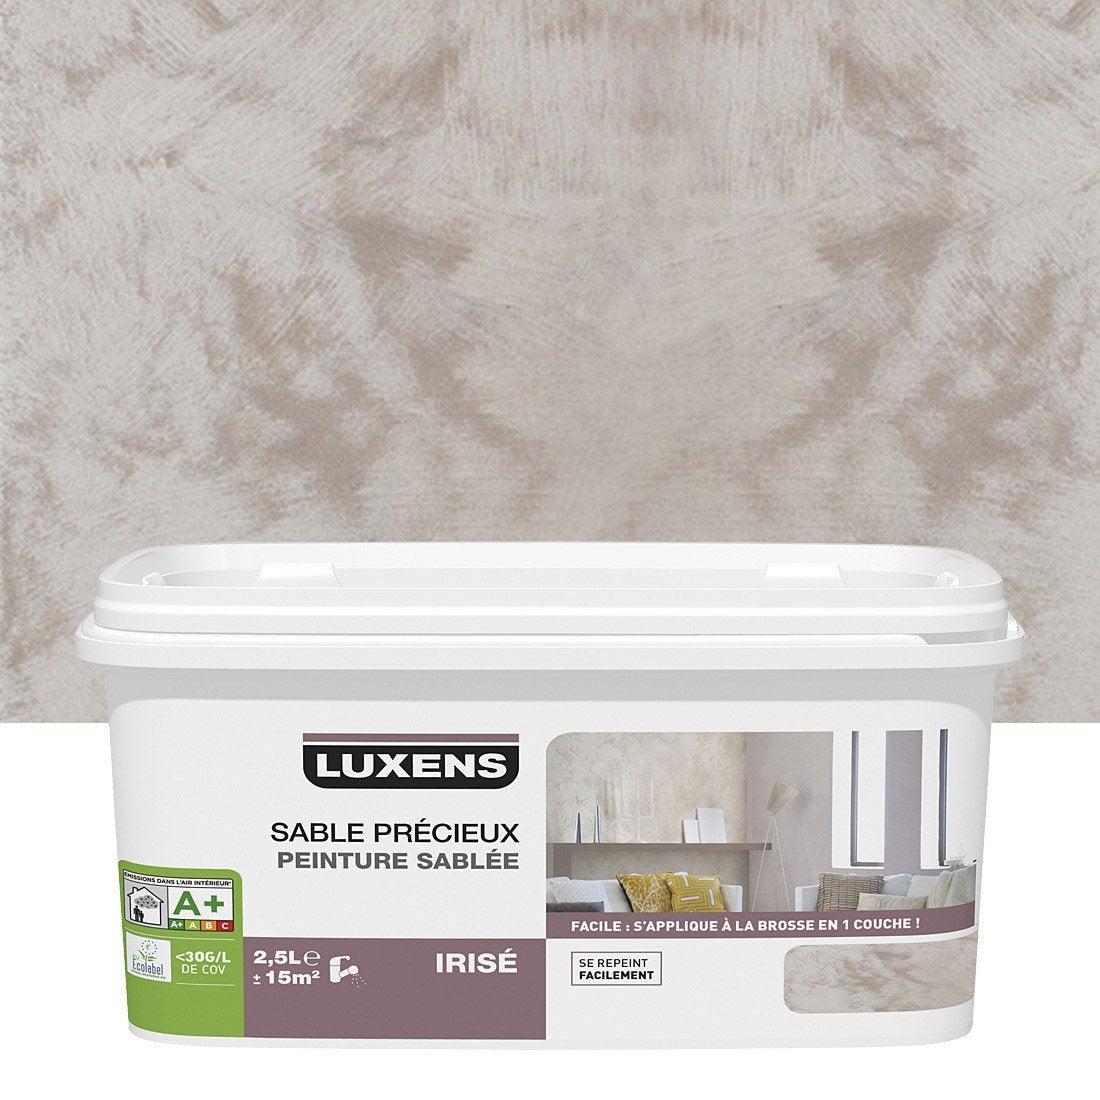 Peinture d corative sable pr cieux luxens brun taupe 6 2 5 l leroy merlin - Peinture castorama ou leroy merlin ...